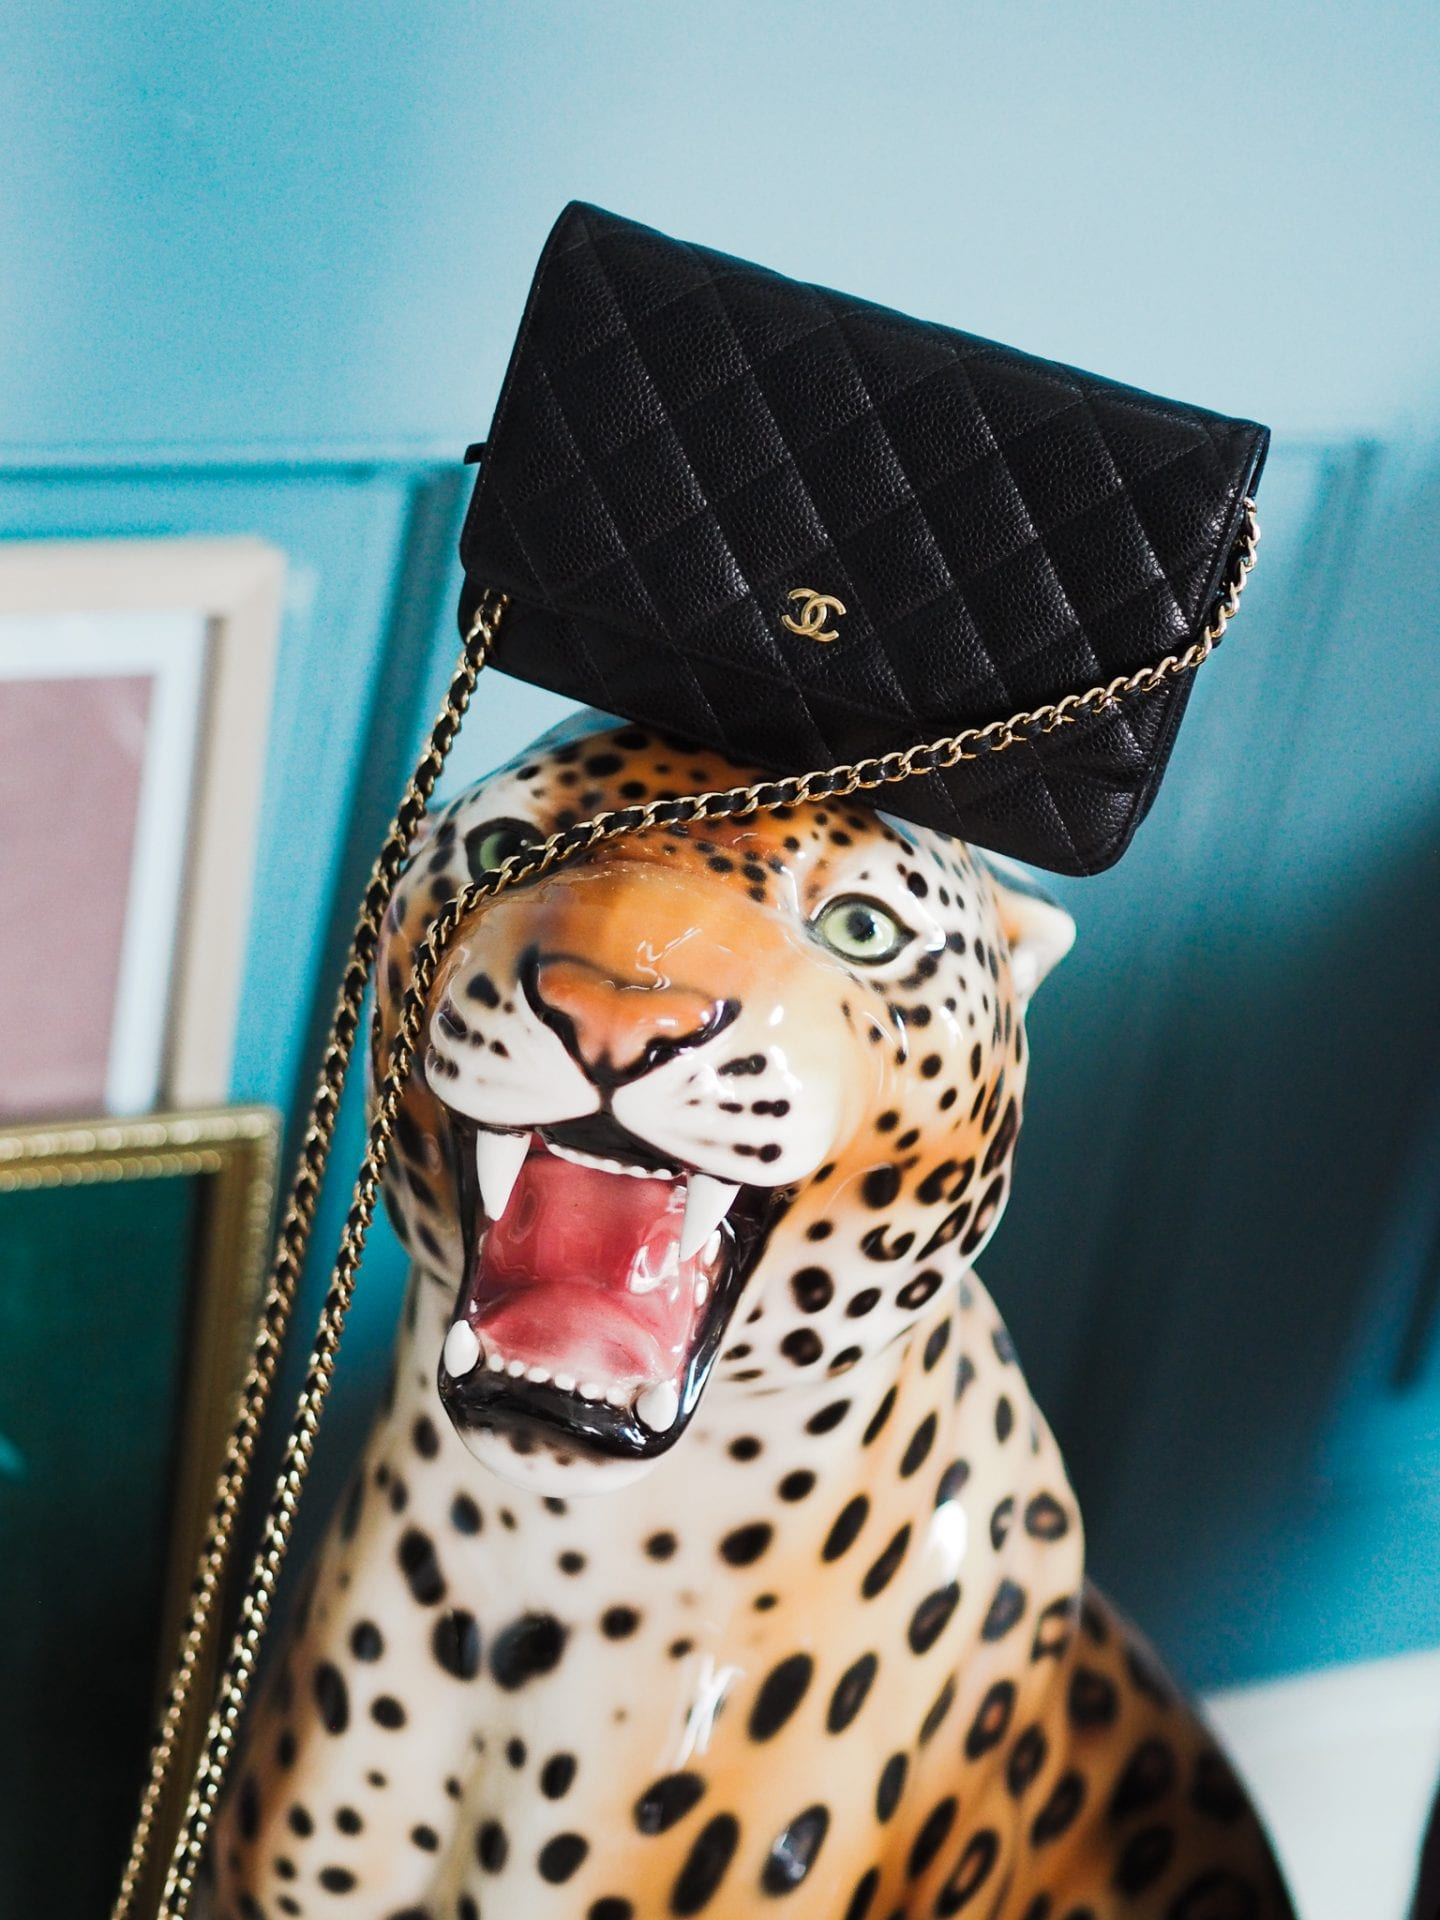 chanel-woc-review-handbag-bag-cheapest-chanel-bag-gold-black